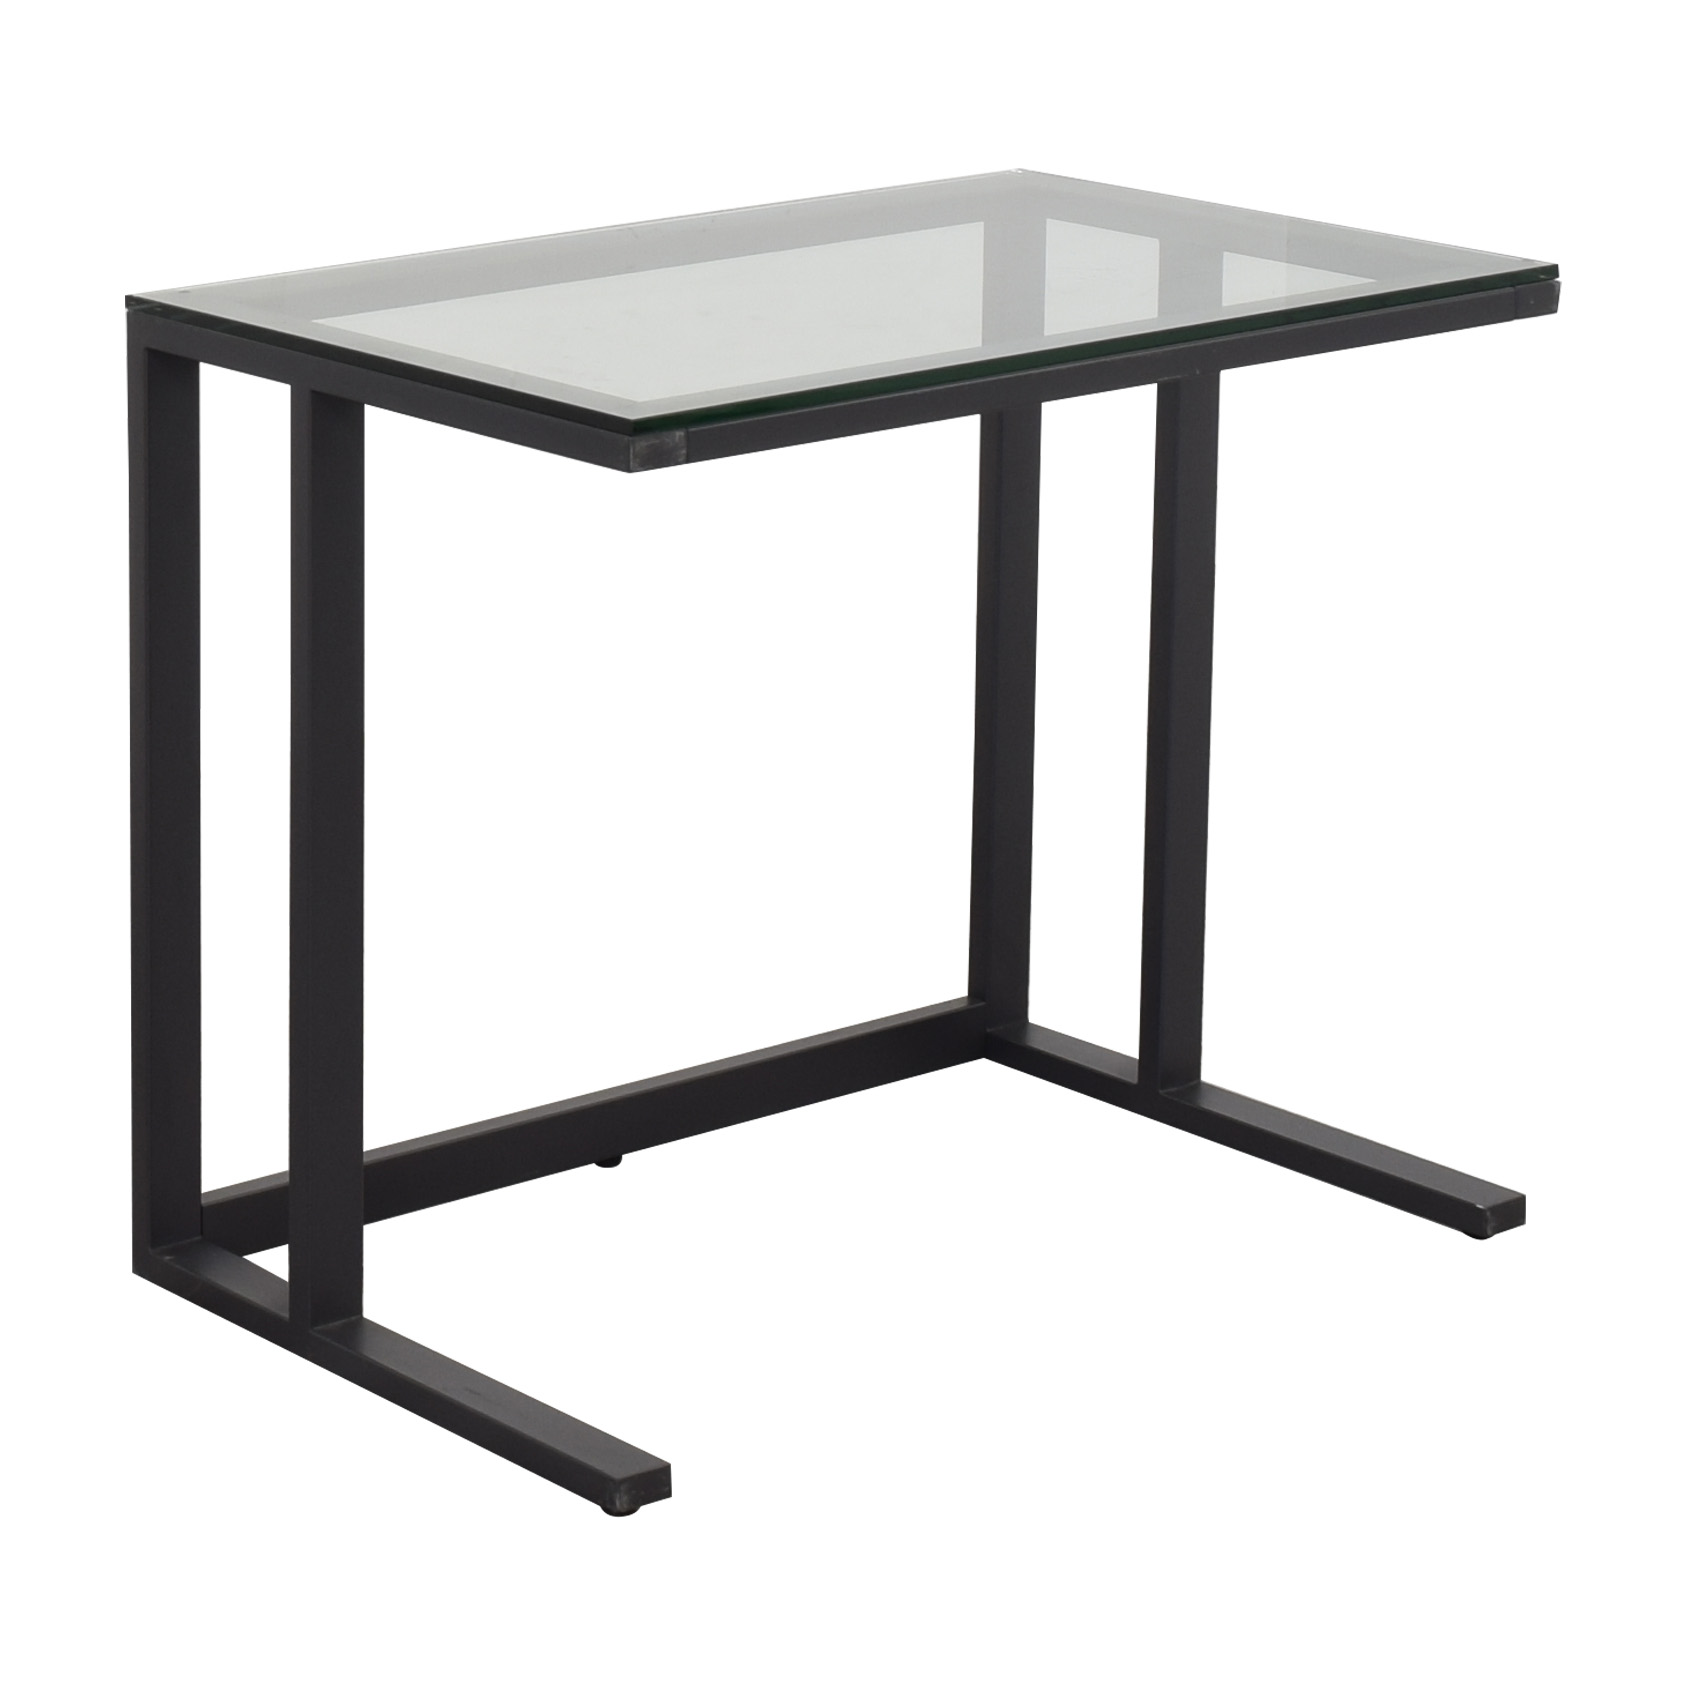 Crate & Barrel Crate & Barrel Glass Top Desk on sale